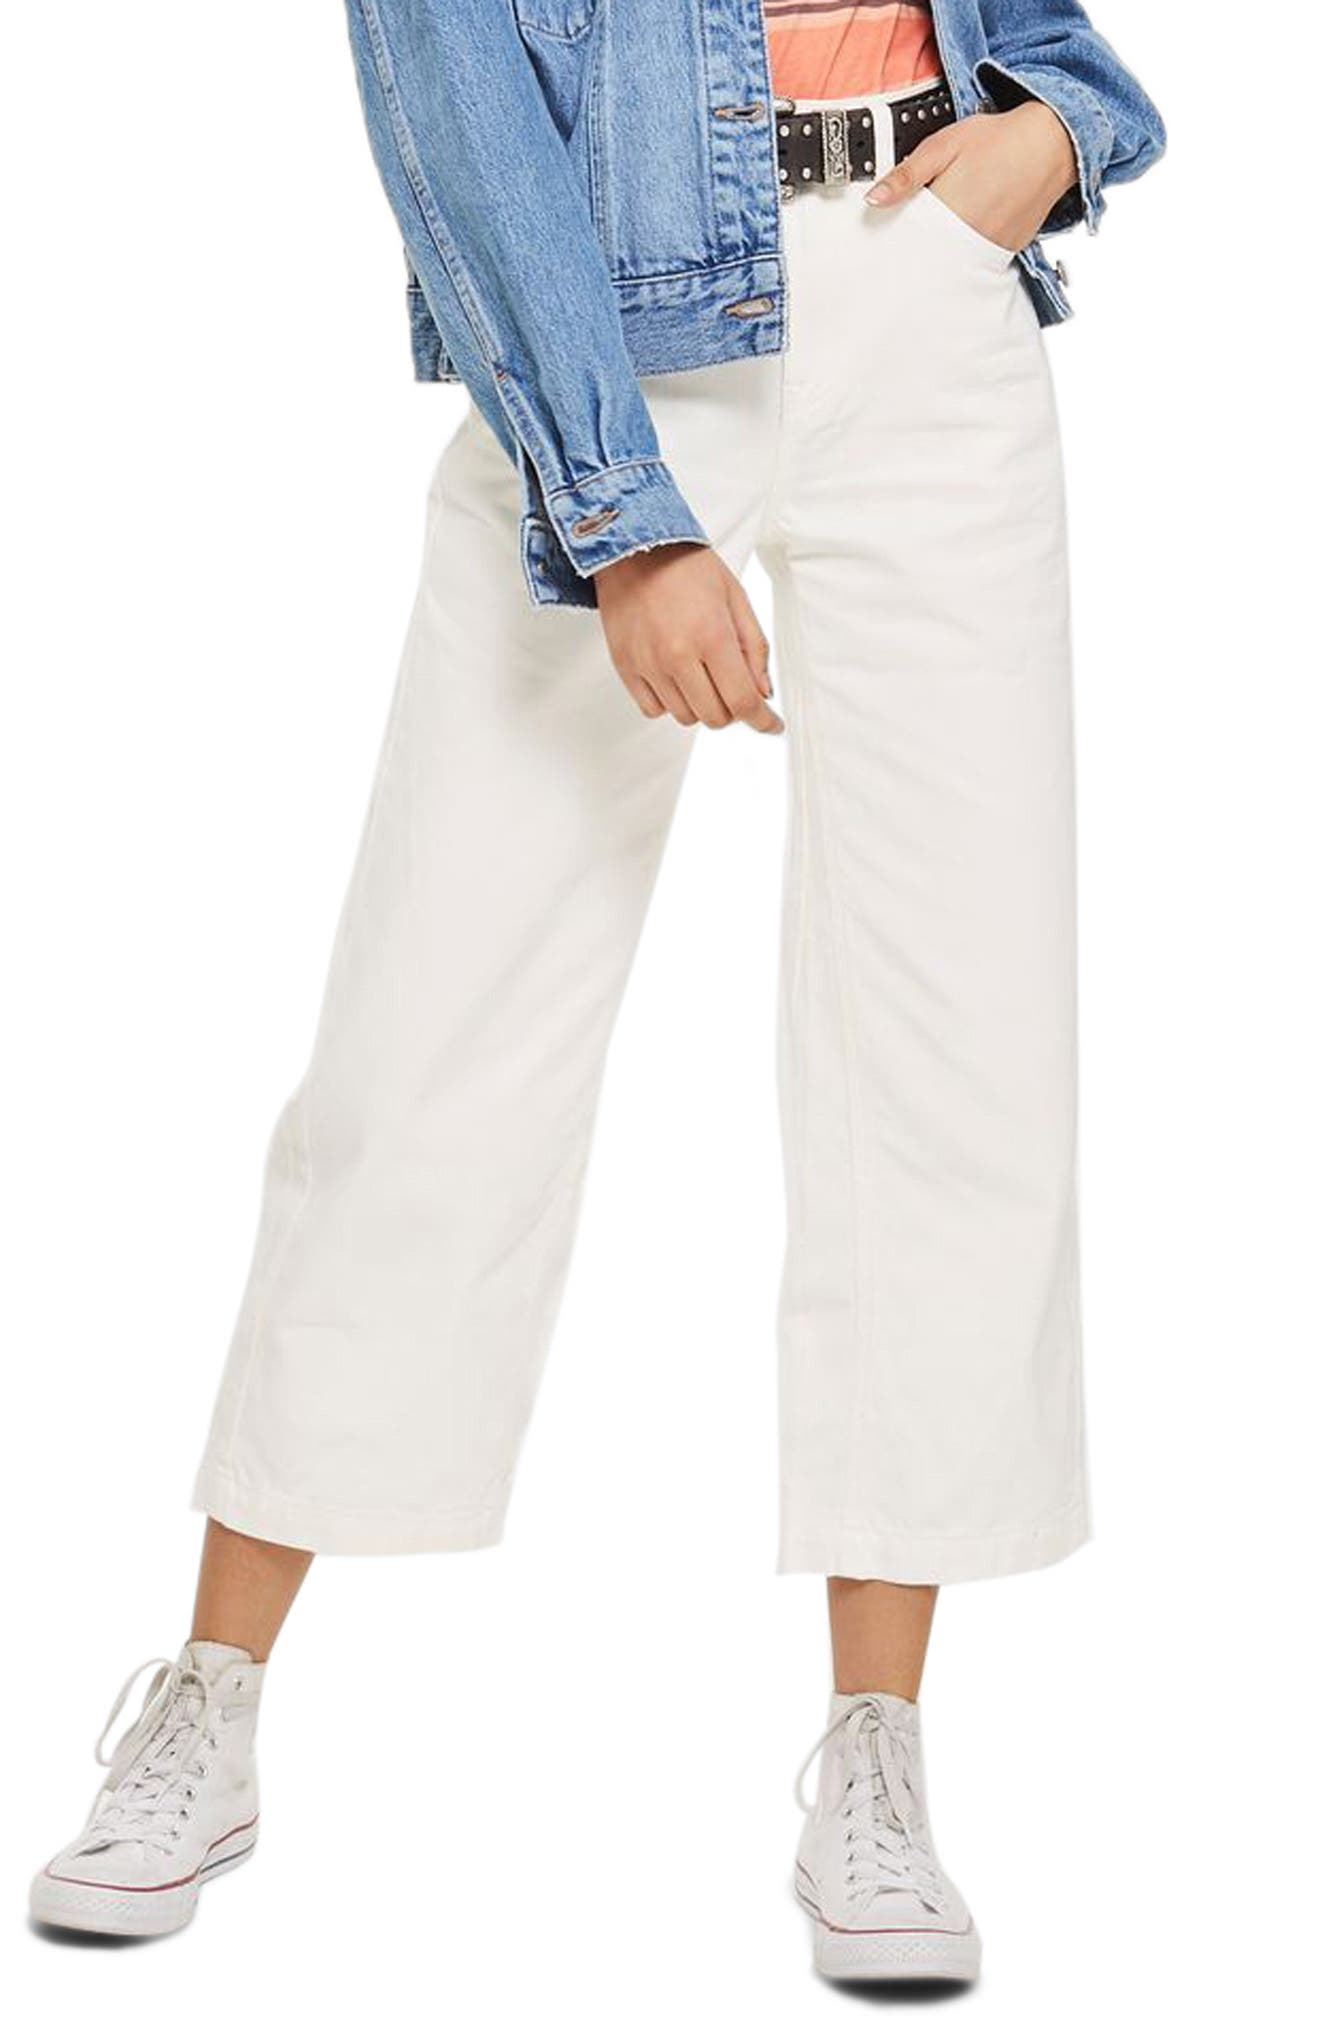 MOTO Cropped Wide Leg Non-Stretch Jeans,                         Main,                         color, White